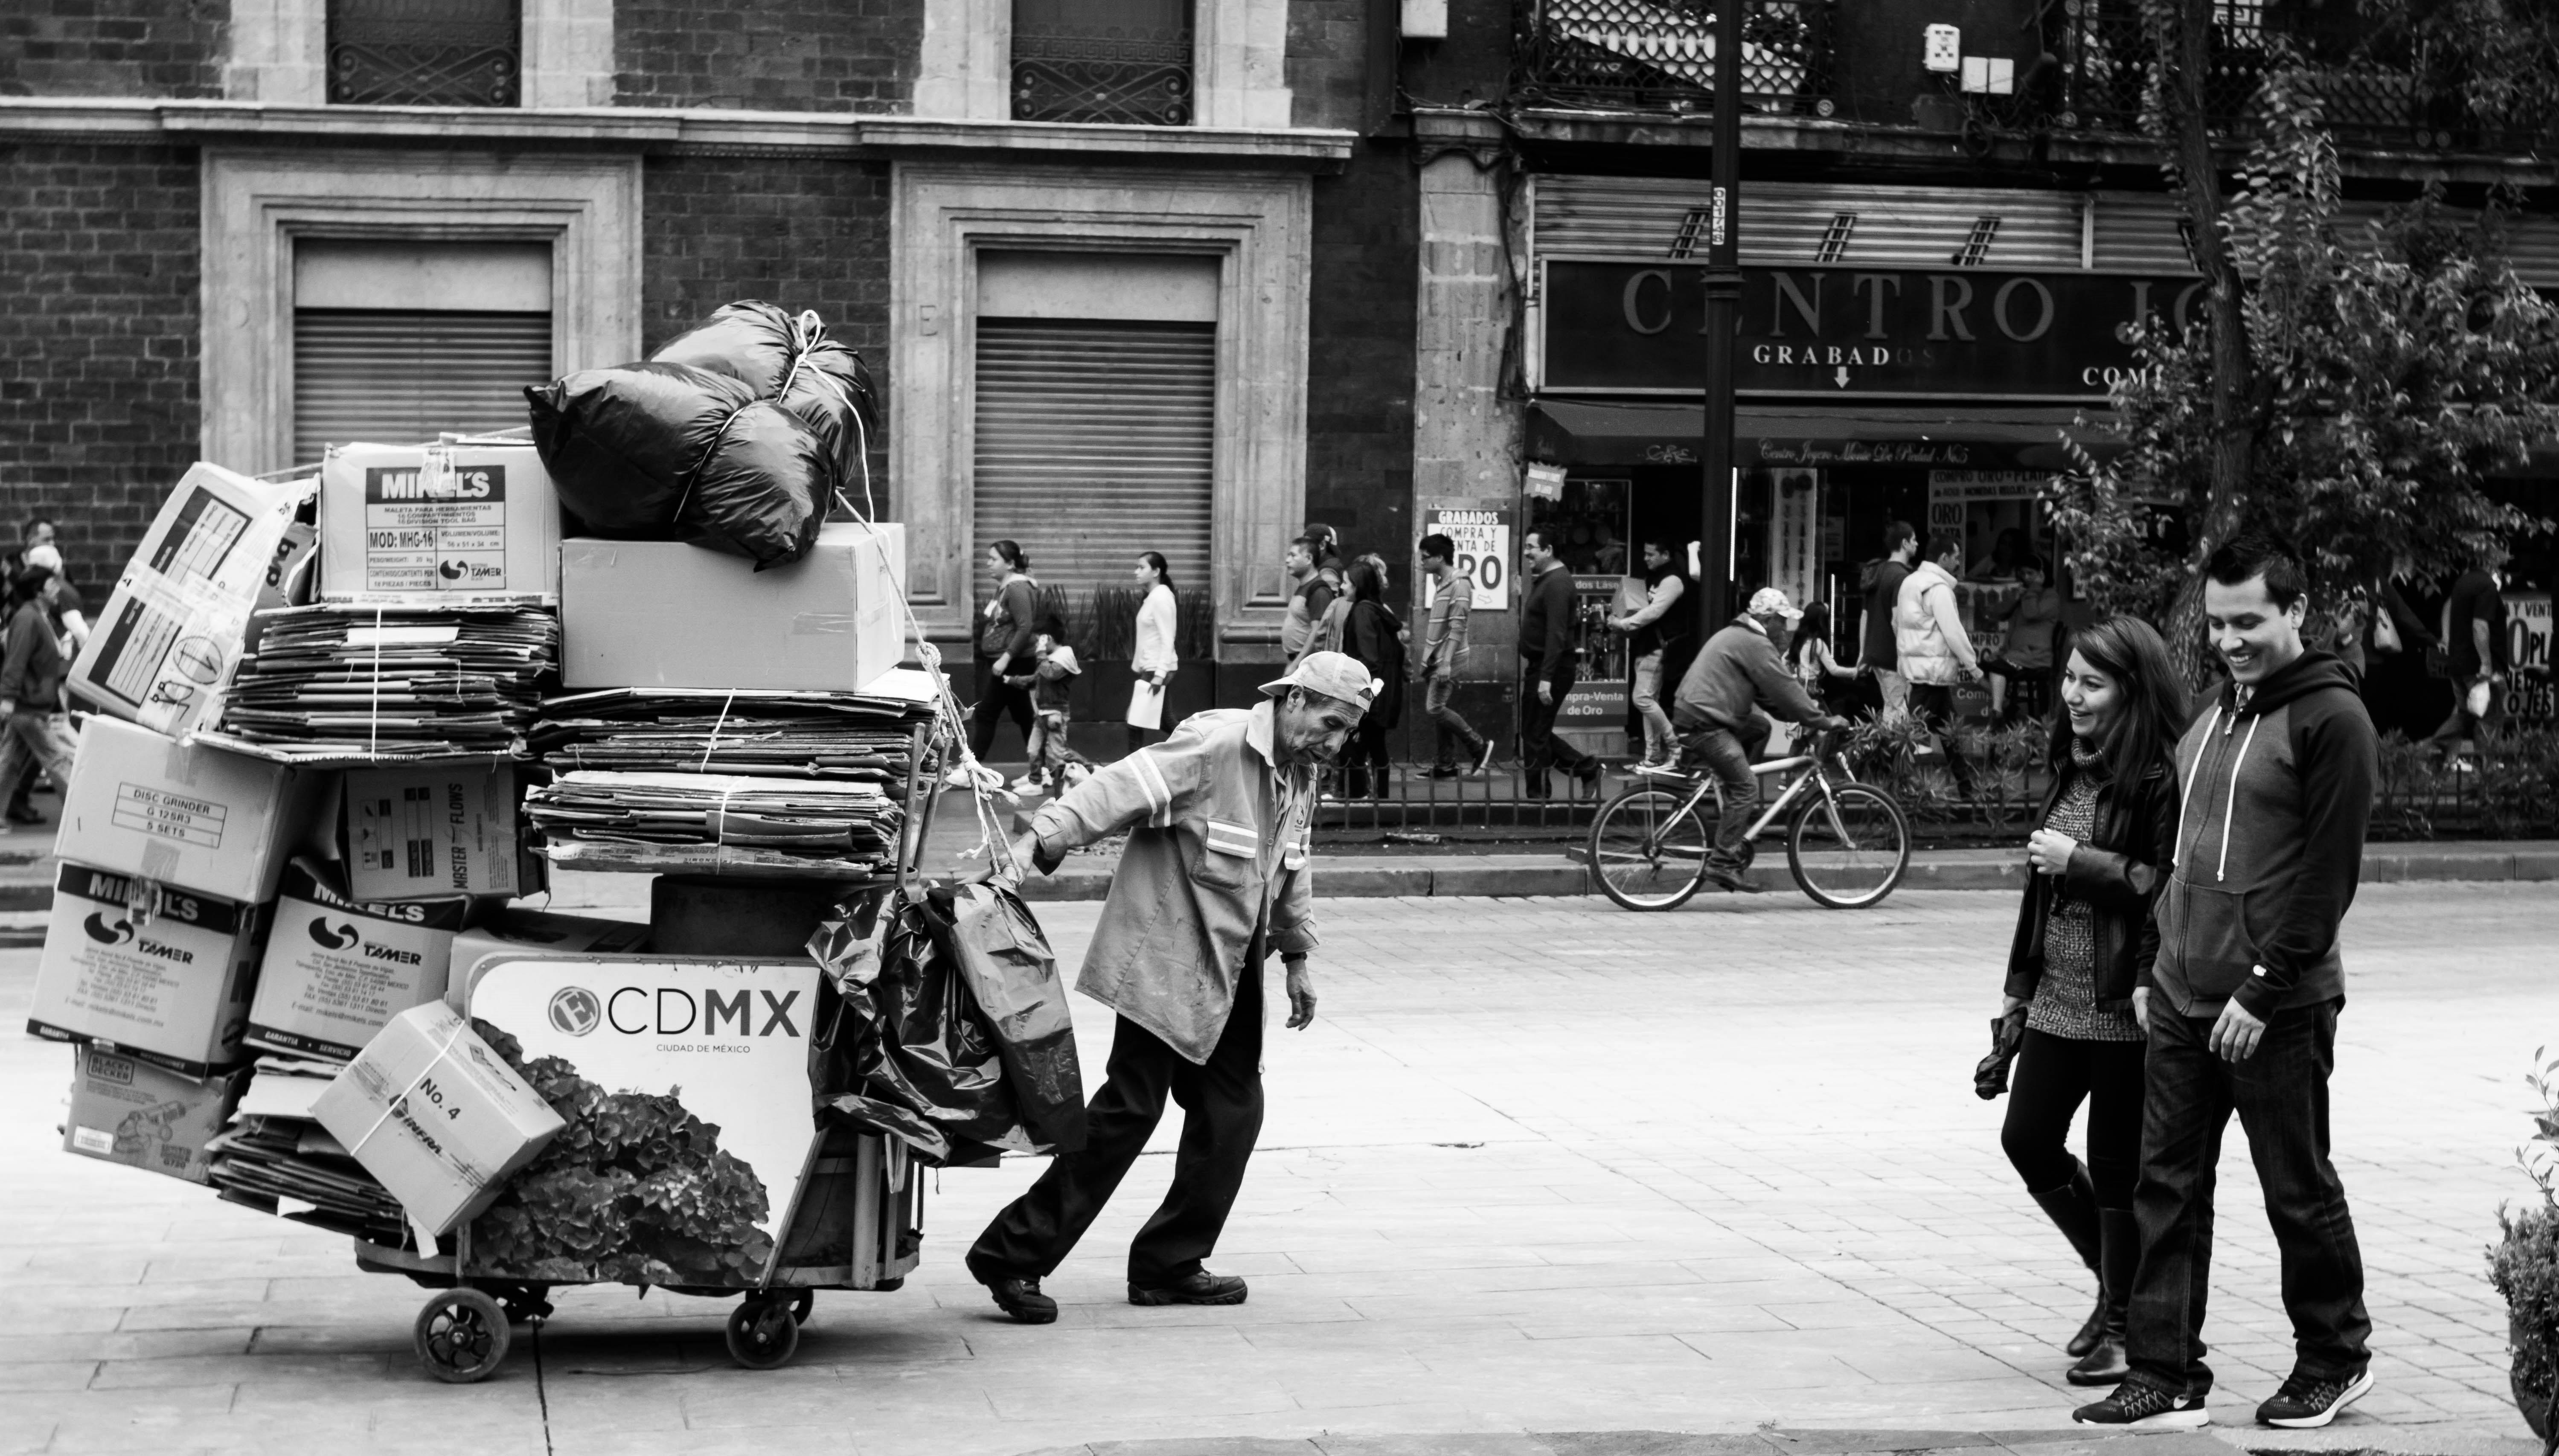 man dragging wagon with cardboard boxes